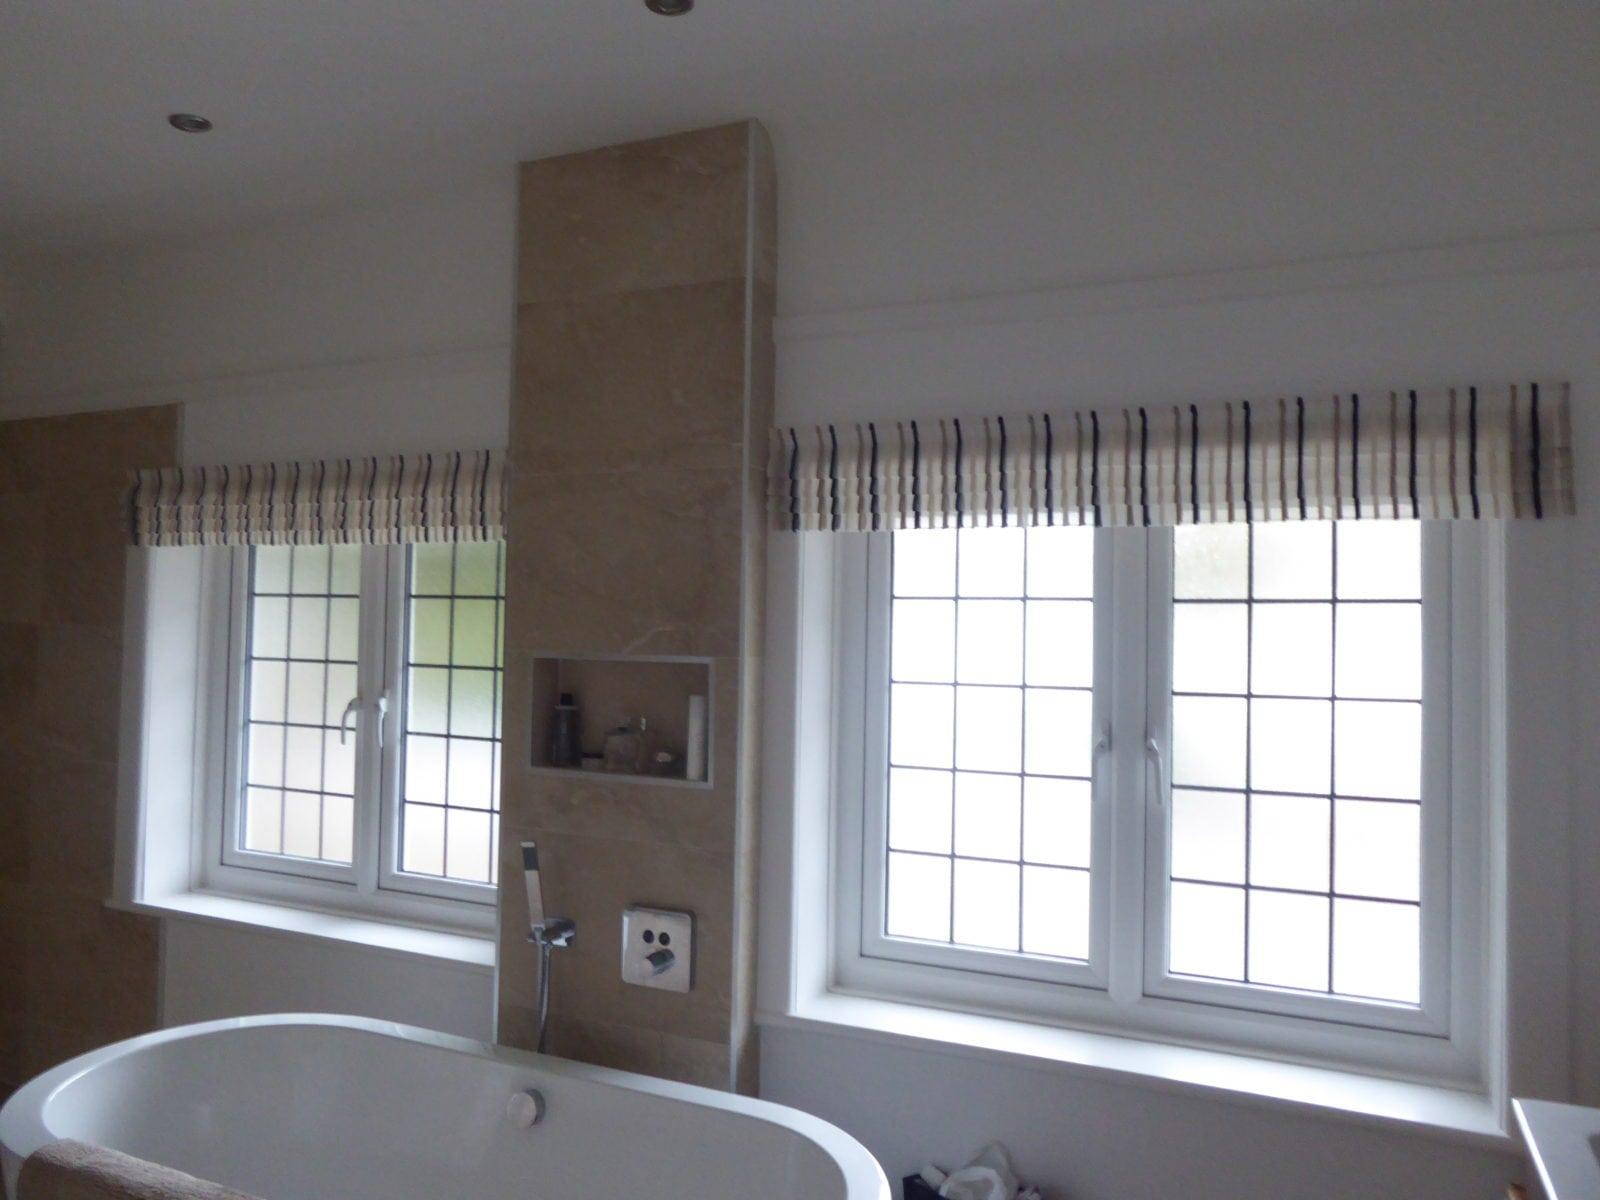 Refurbished Voile Faux Roman Blinds Buzz Interior Design